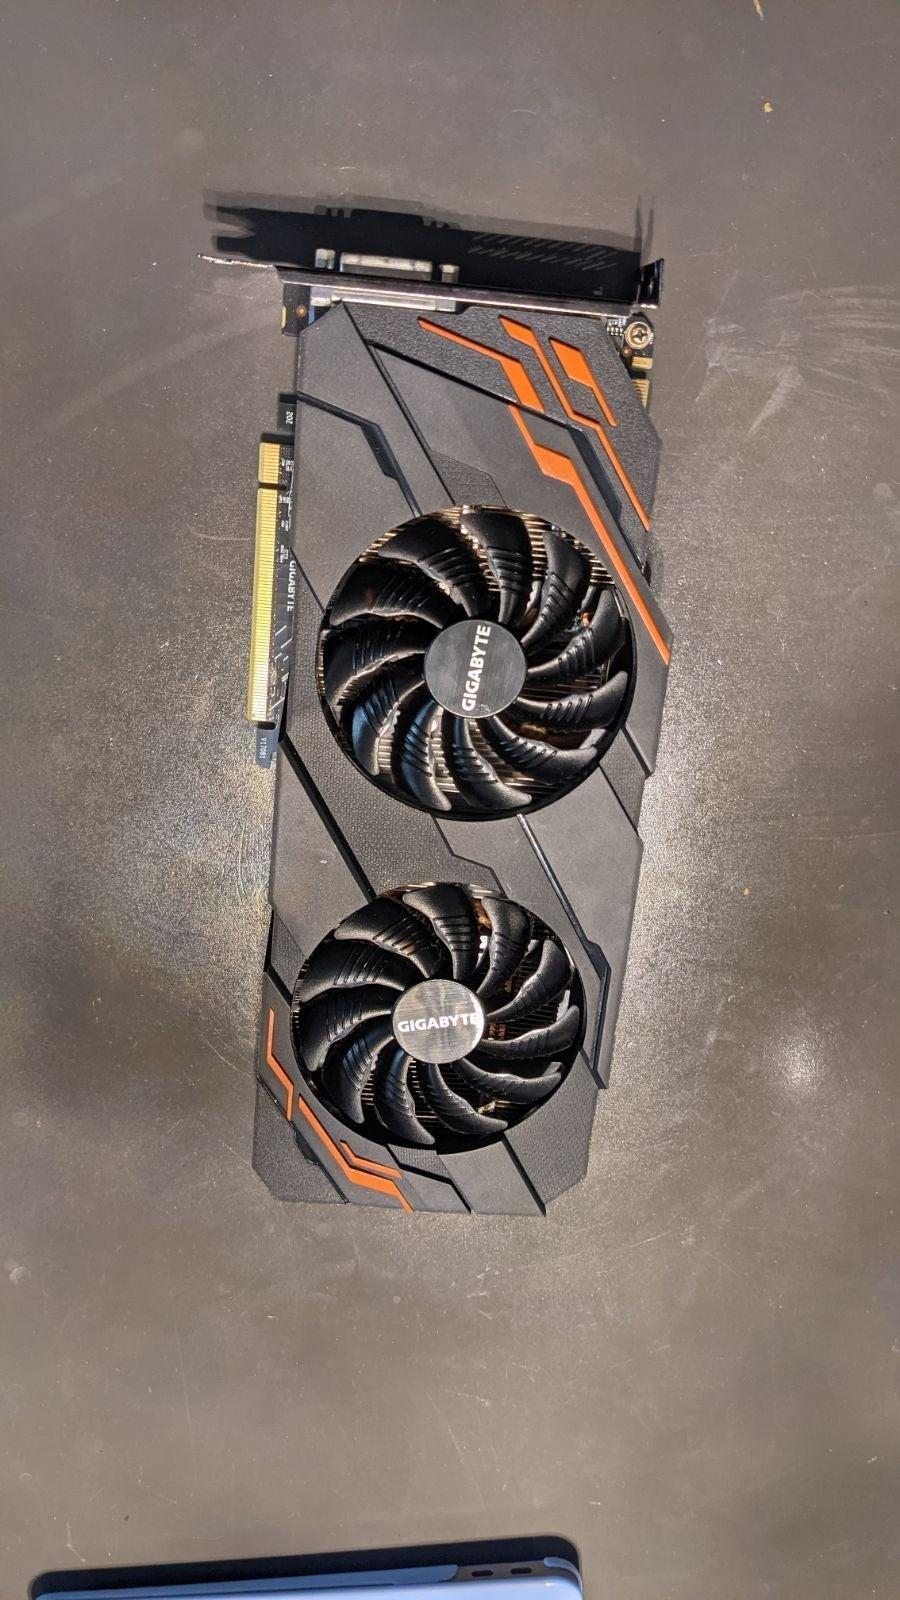 GTX 1070 Gigabyte GeForce G1 Gaming 8G